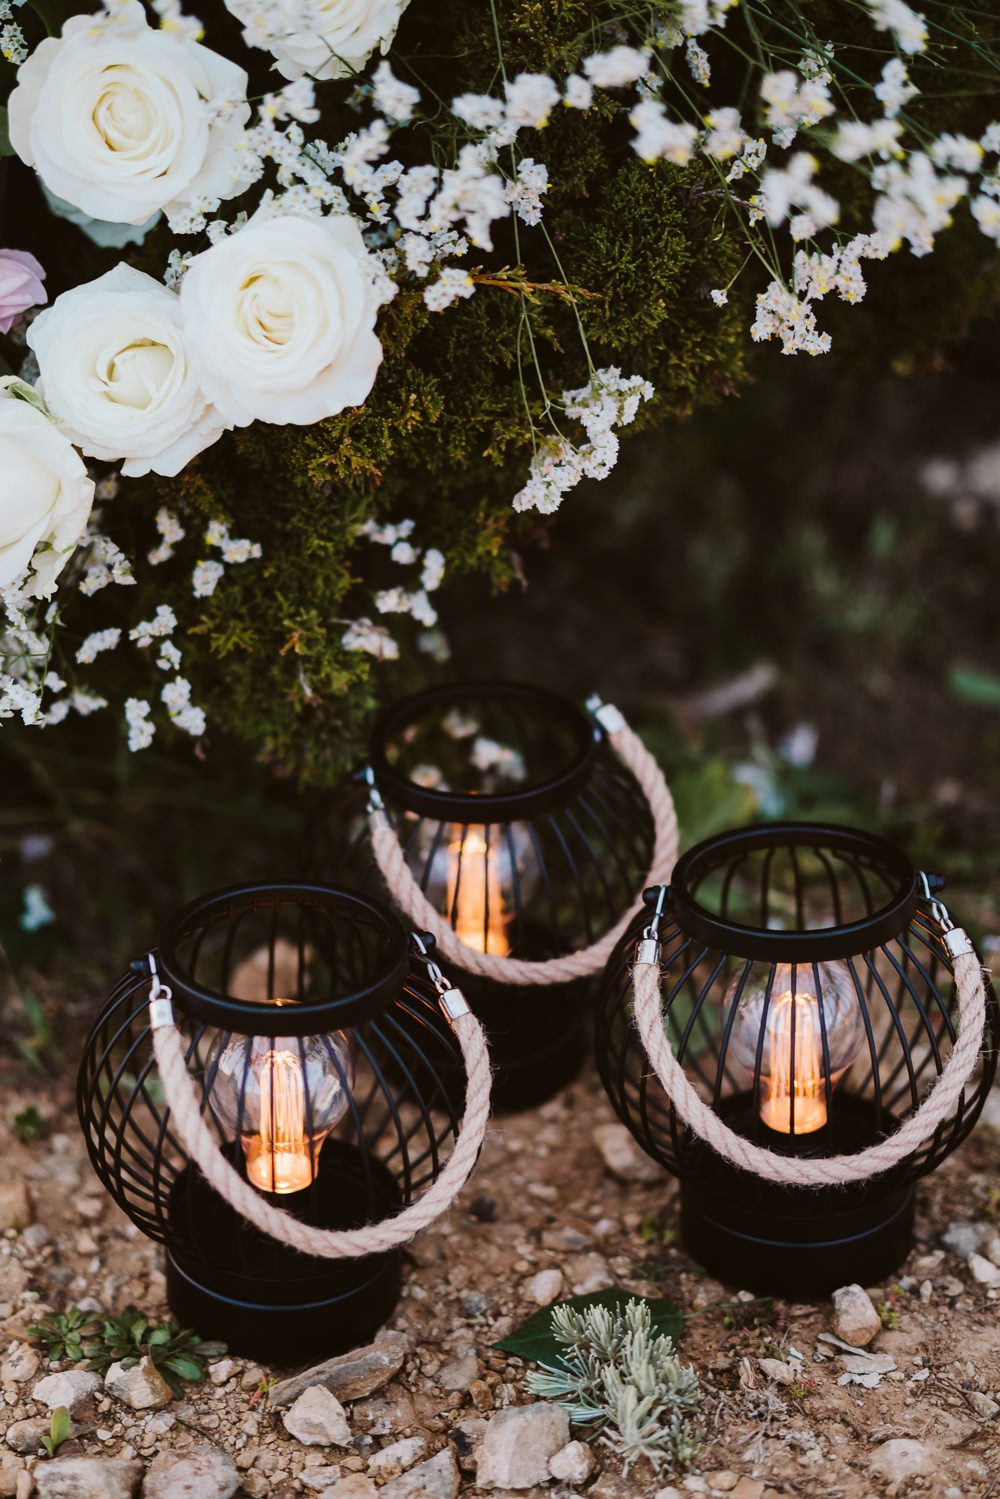 Lantern Candles Clifftop Portugal Wedding Ideas John Barwood Photography